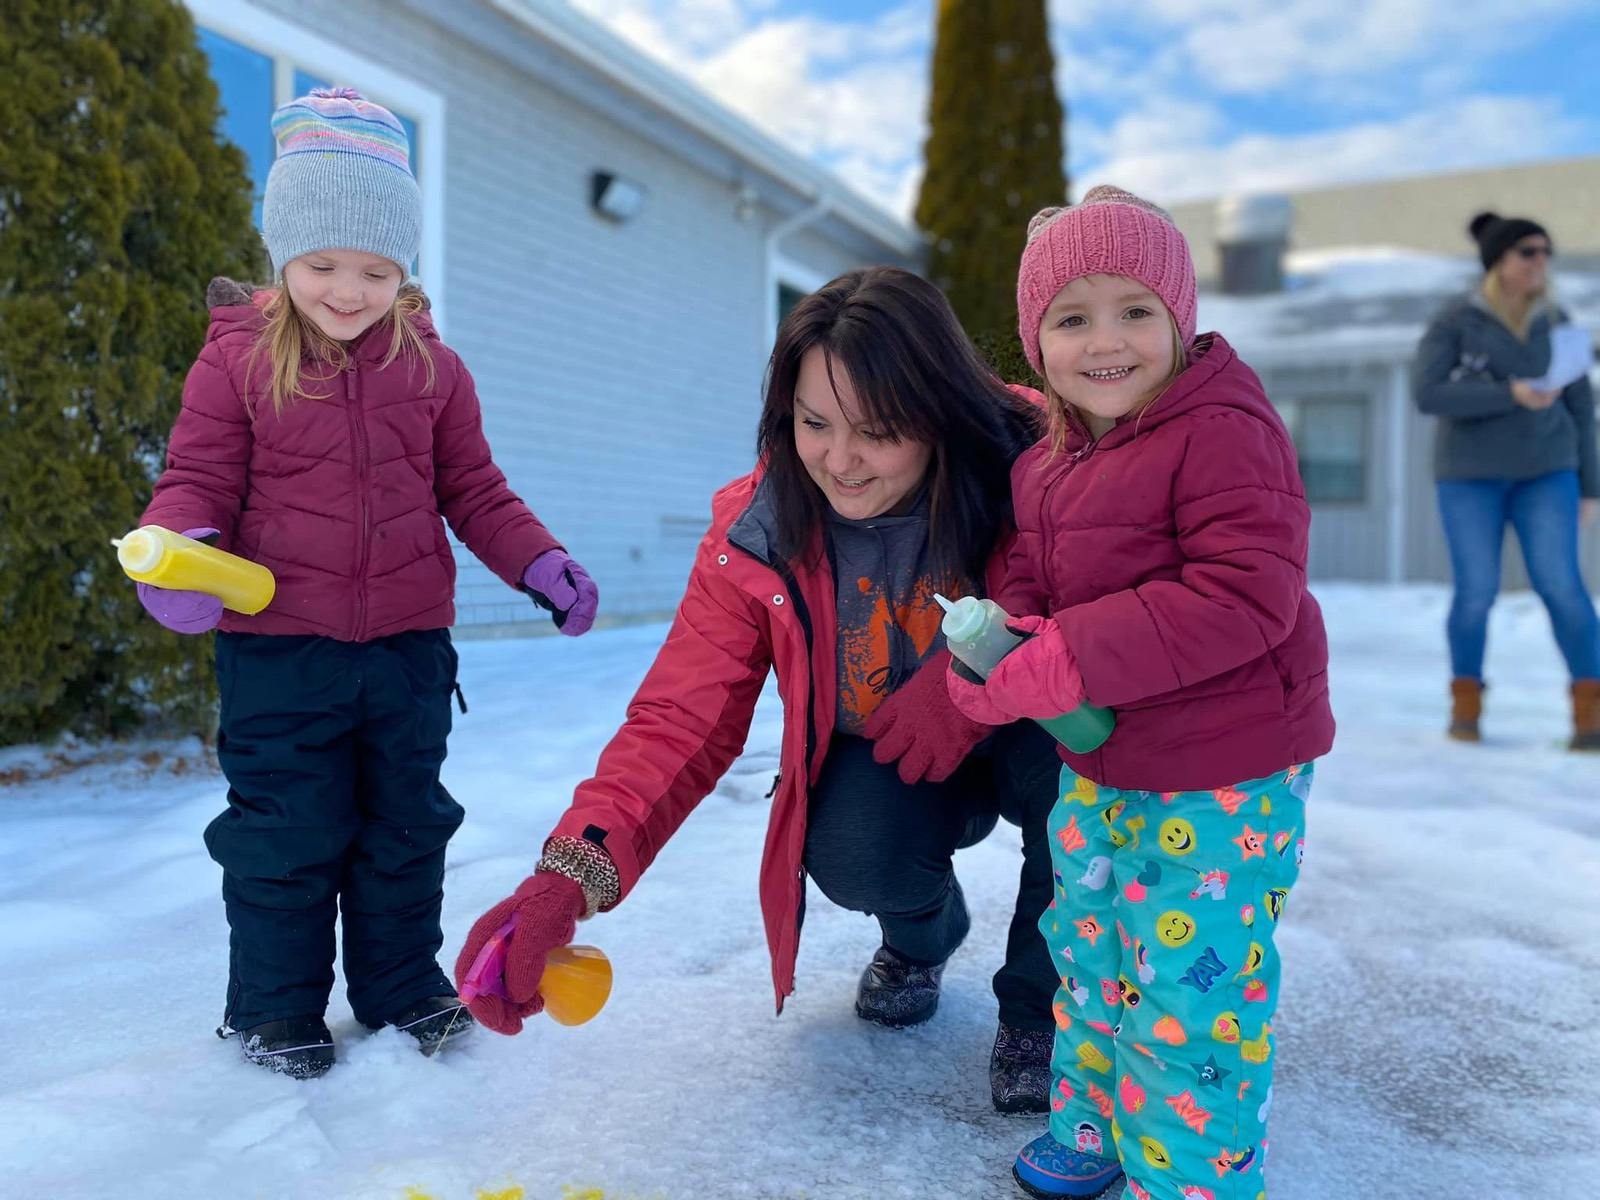 12 Ideas for Outdoor Winter Fun Winter Games 2020 Week 3 Jonesport Elementary School